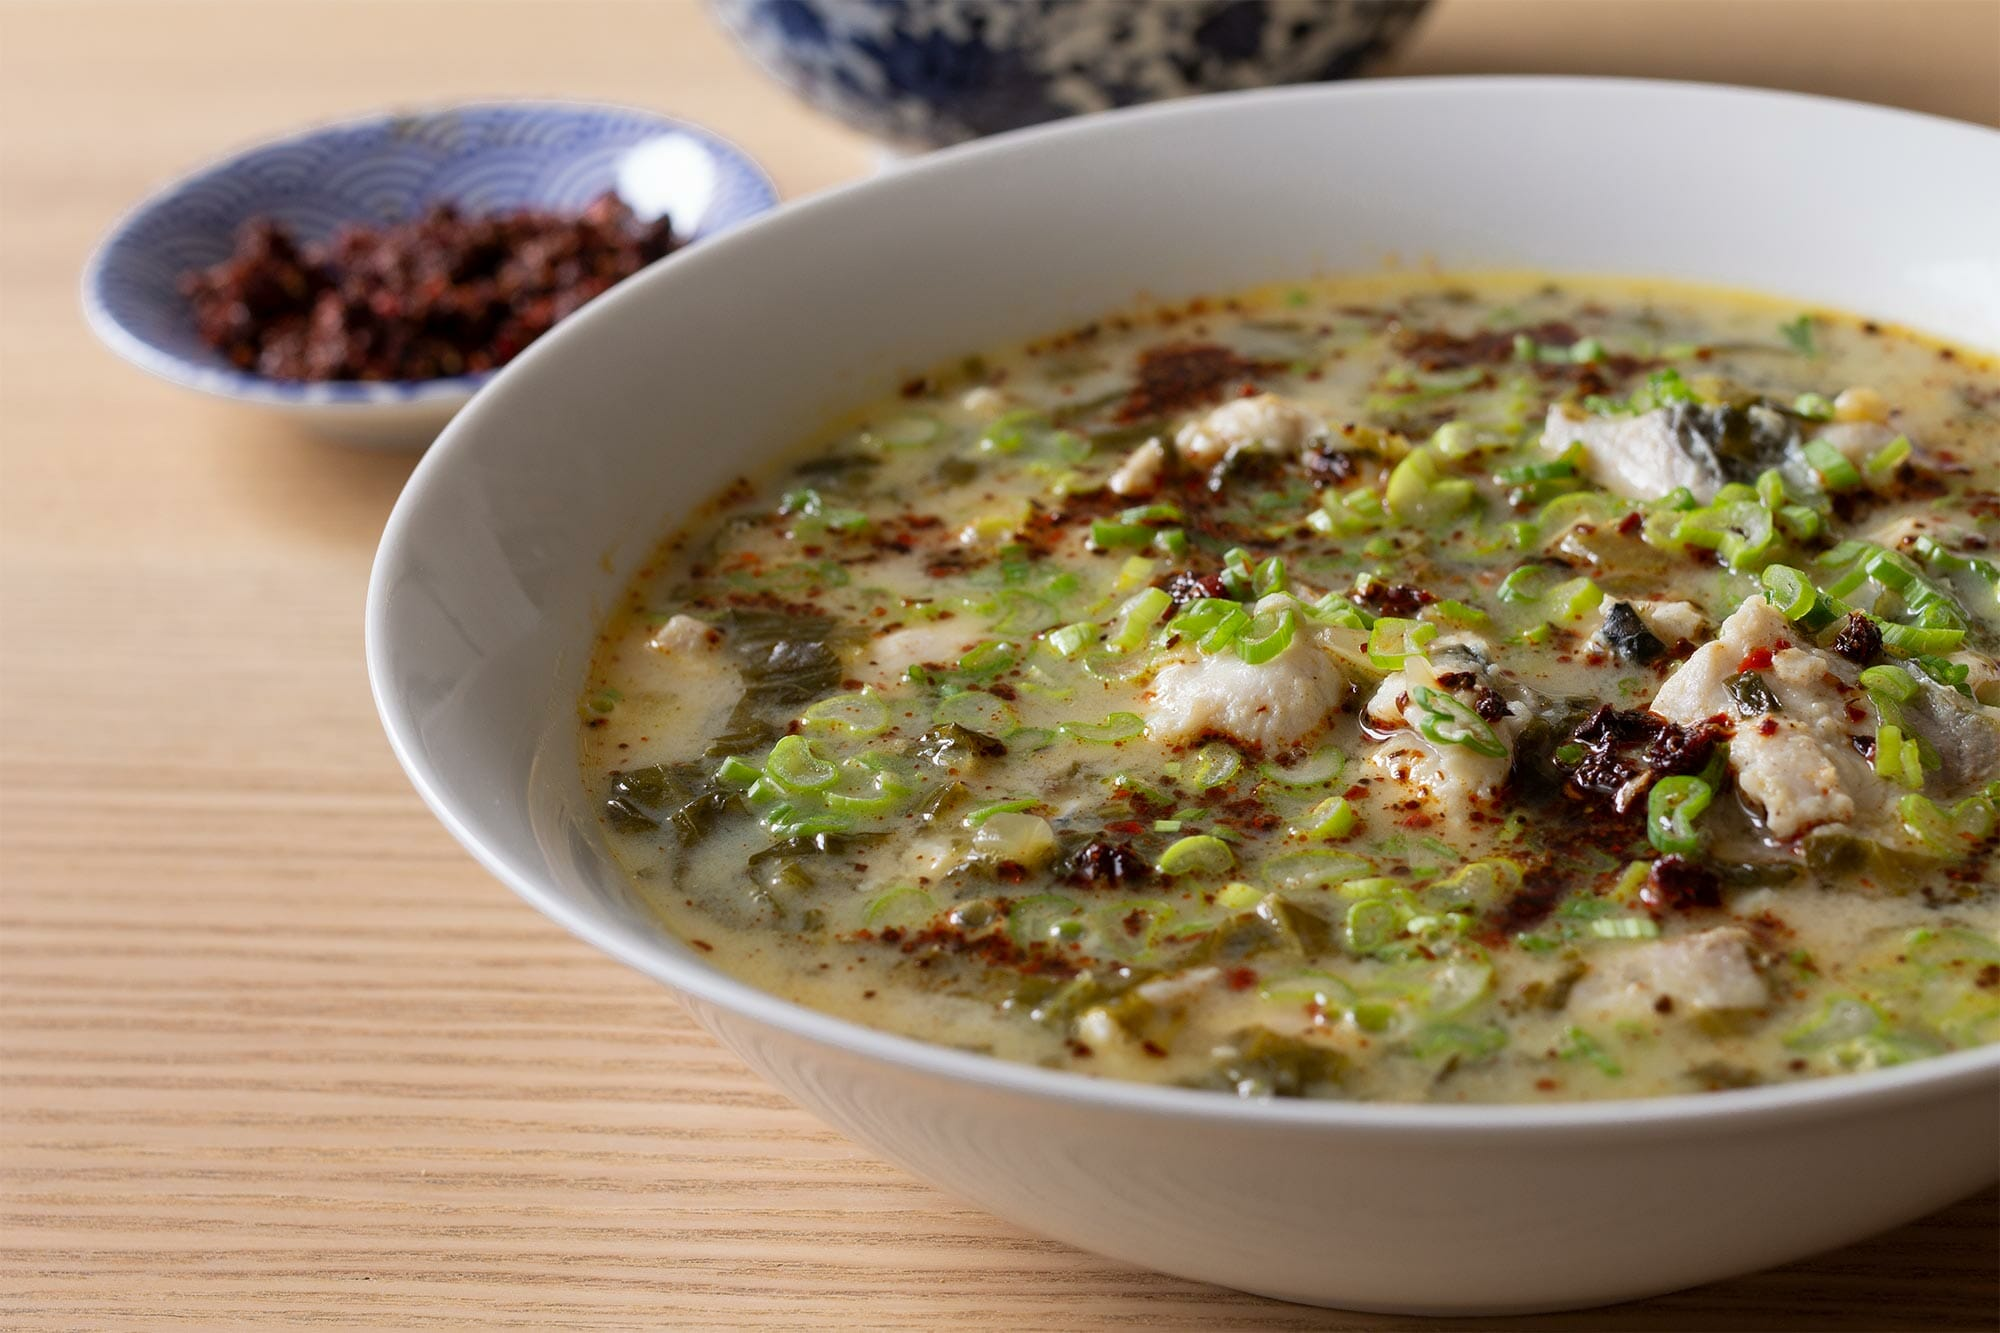 Zuppa di pesce con foglie di senape fermentate